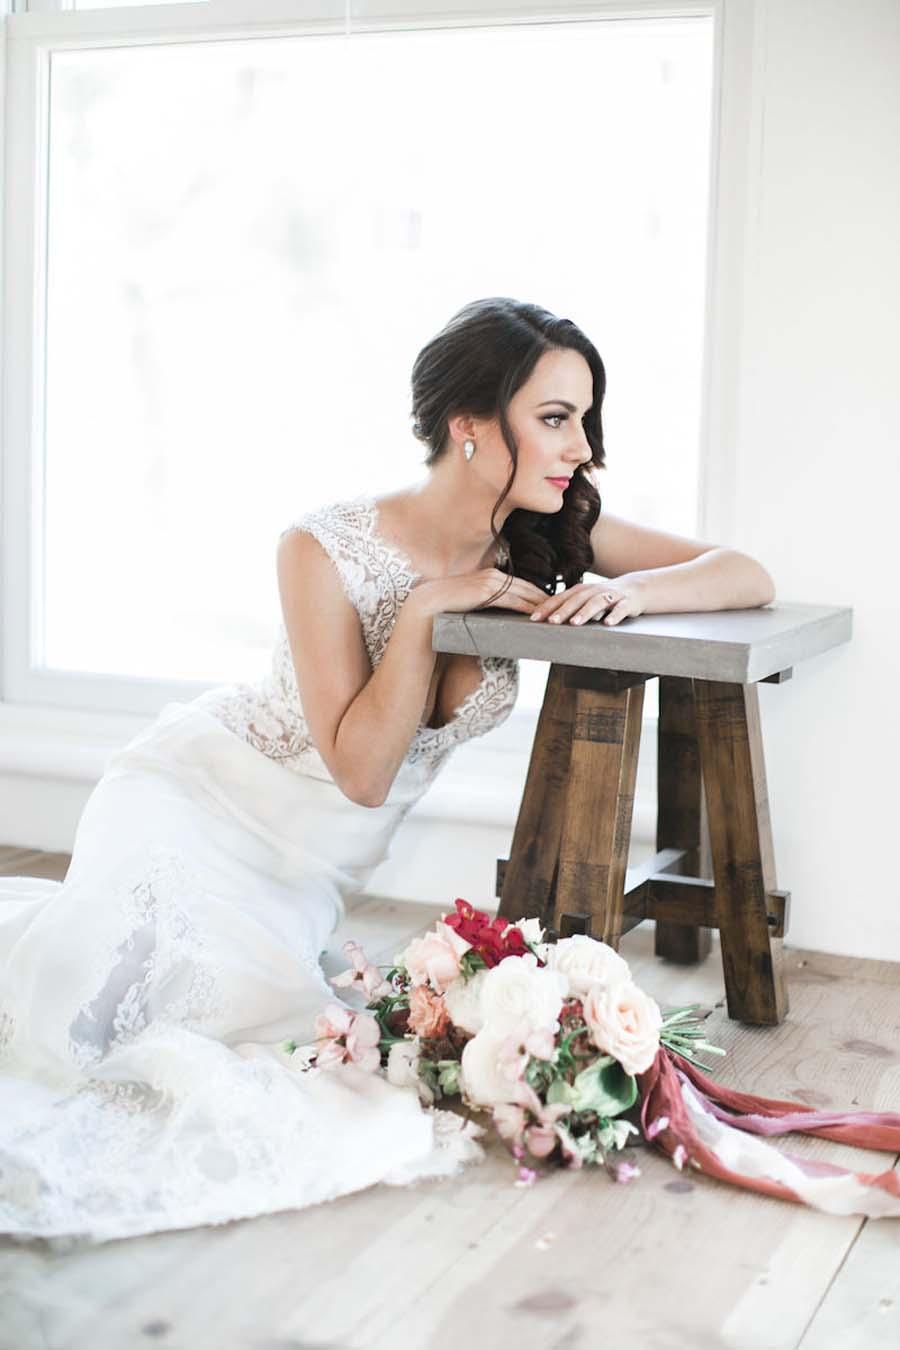 hannahq.com | Hannah Q Photography Denver Colorado and Destination | Portrait and Branding Photographer | Fine Art Photography For Weddings and Lifestyle 0 (6).jpg